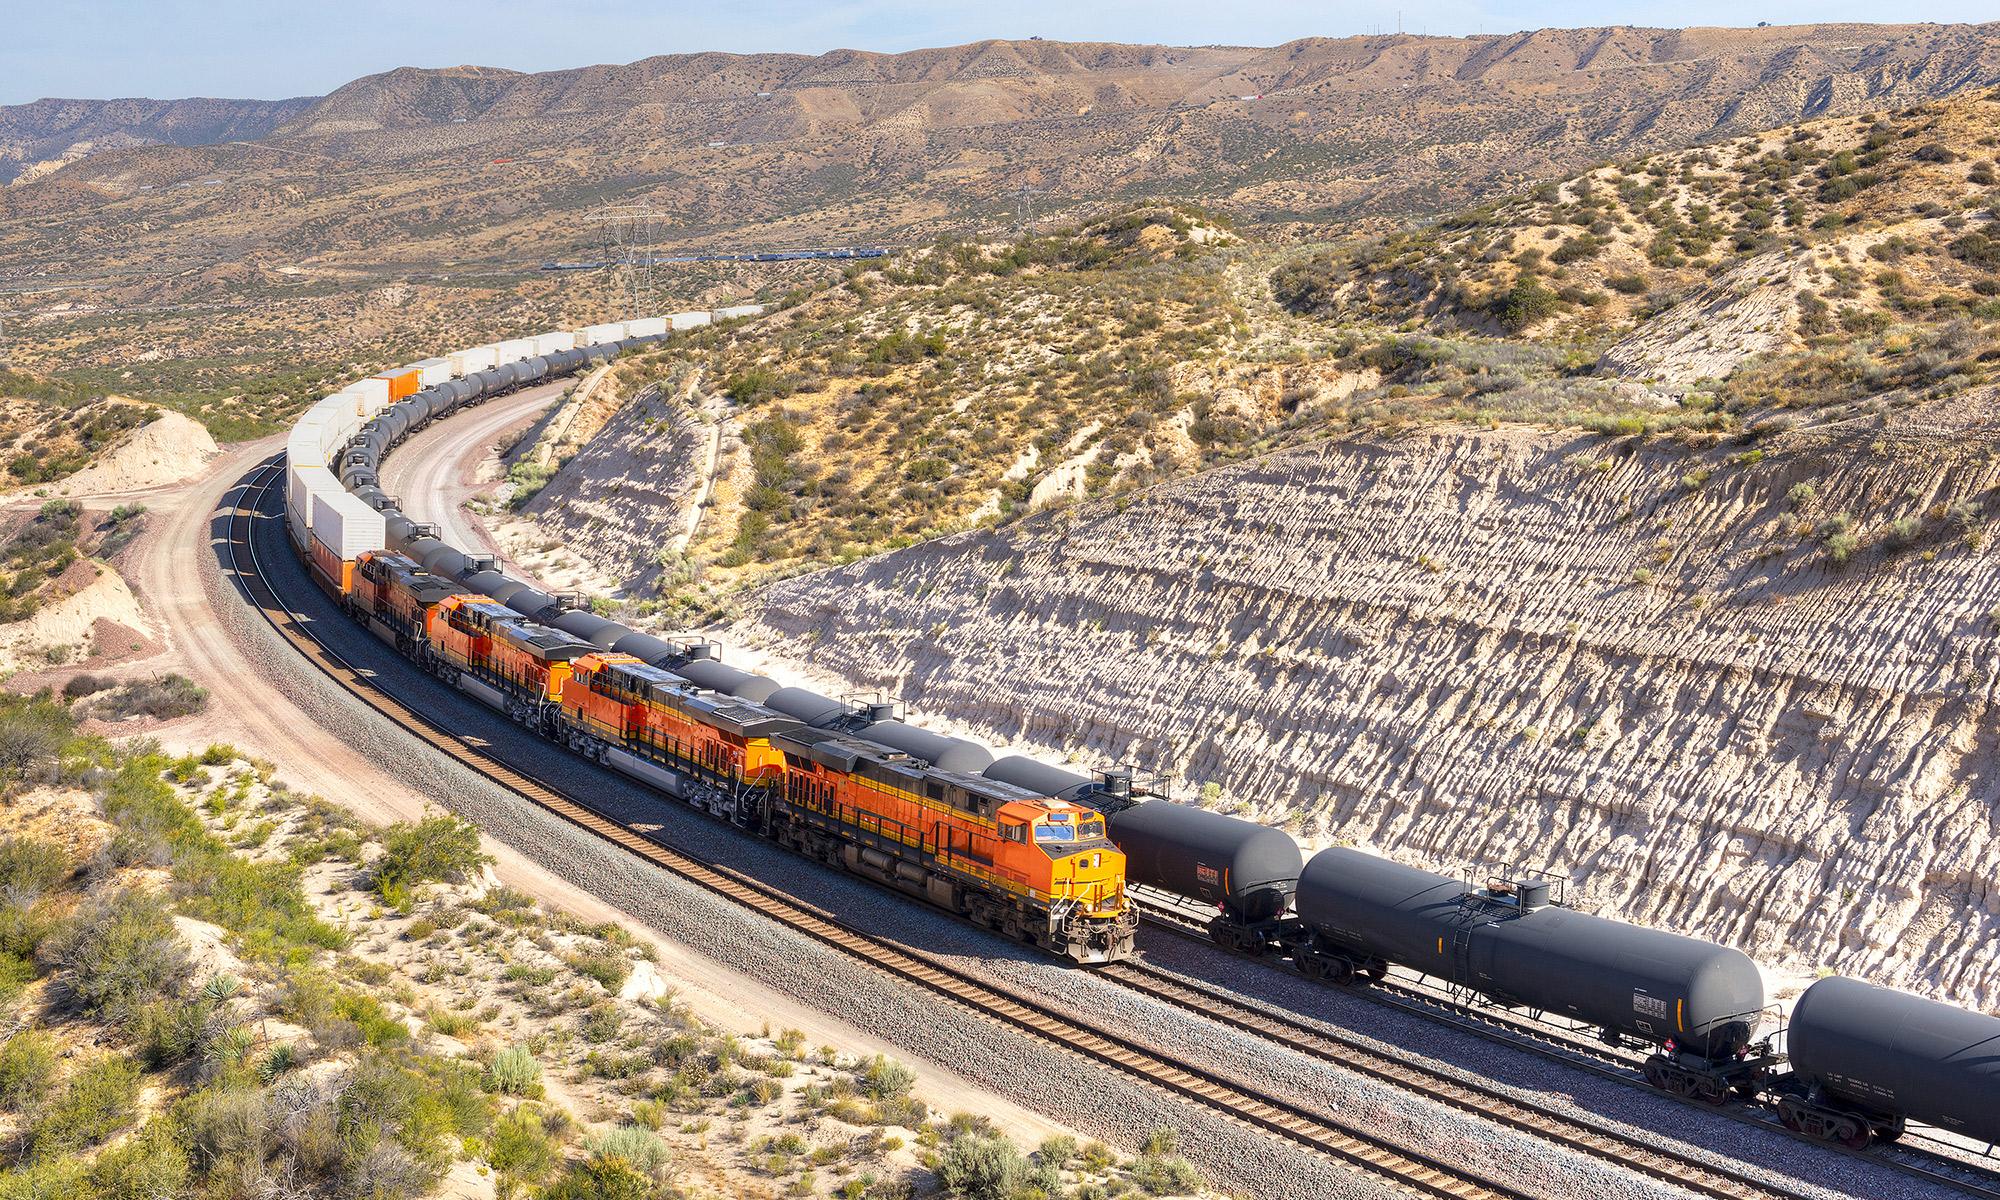 Picture of Tehachapi train loop